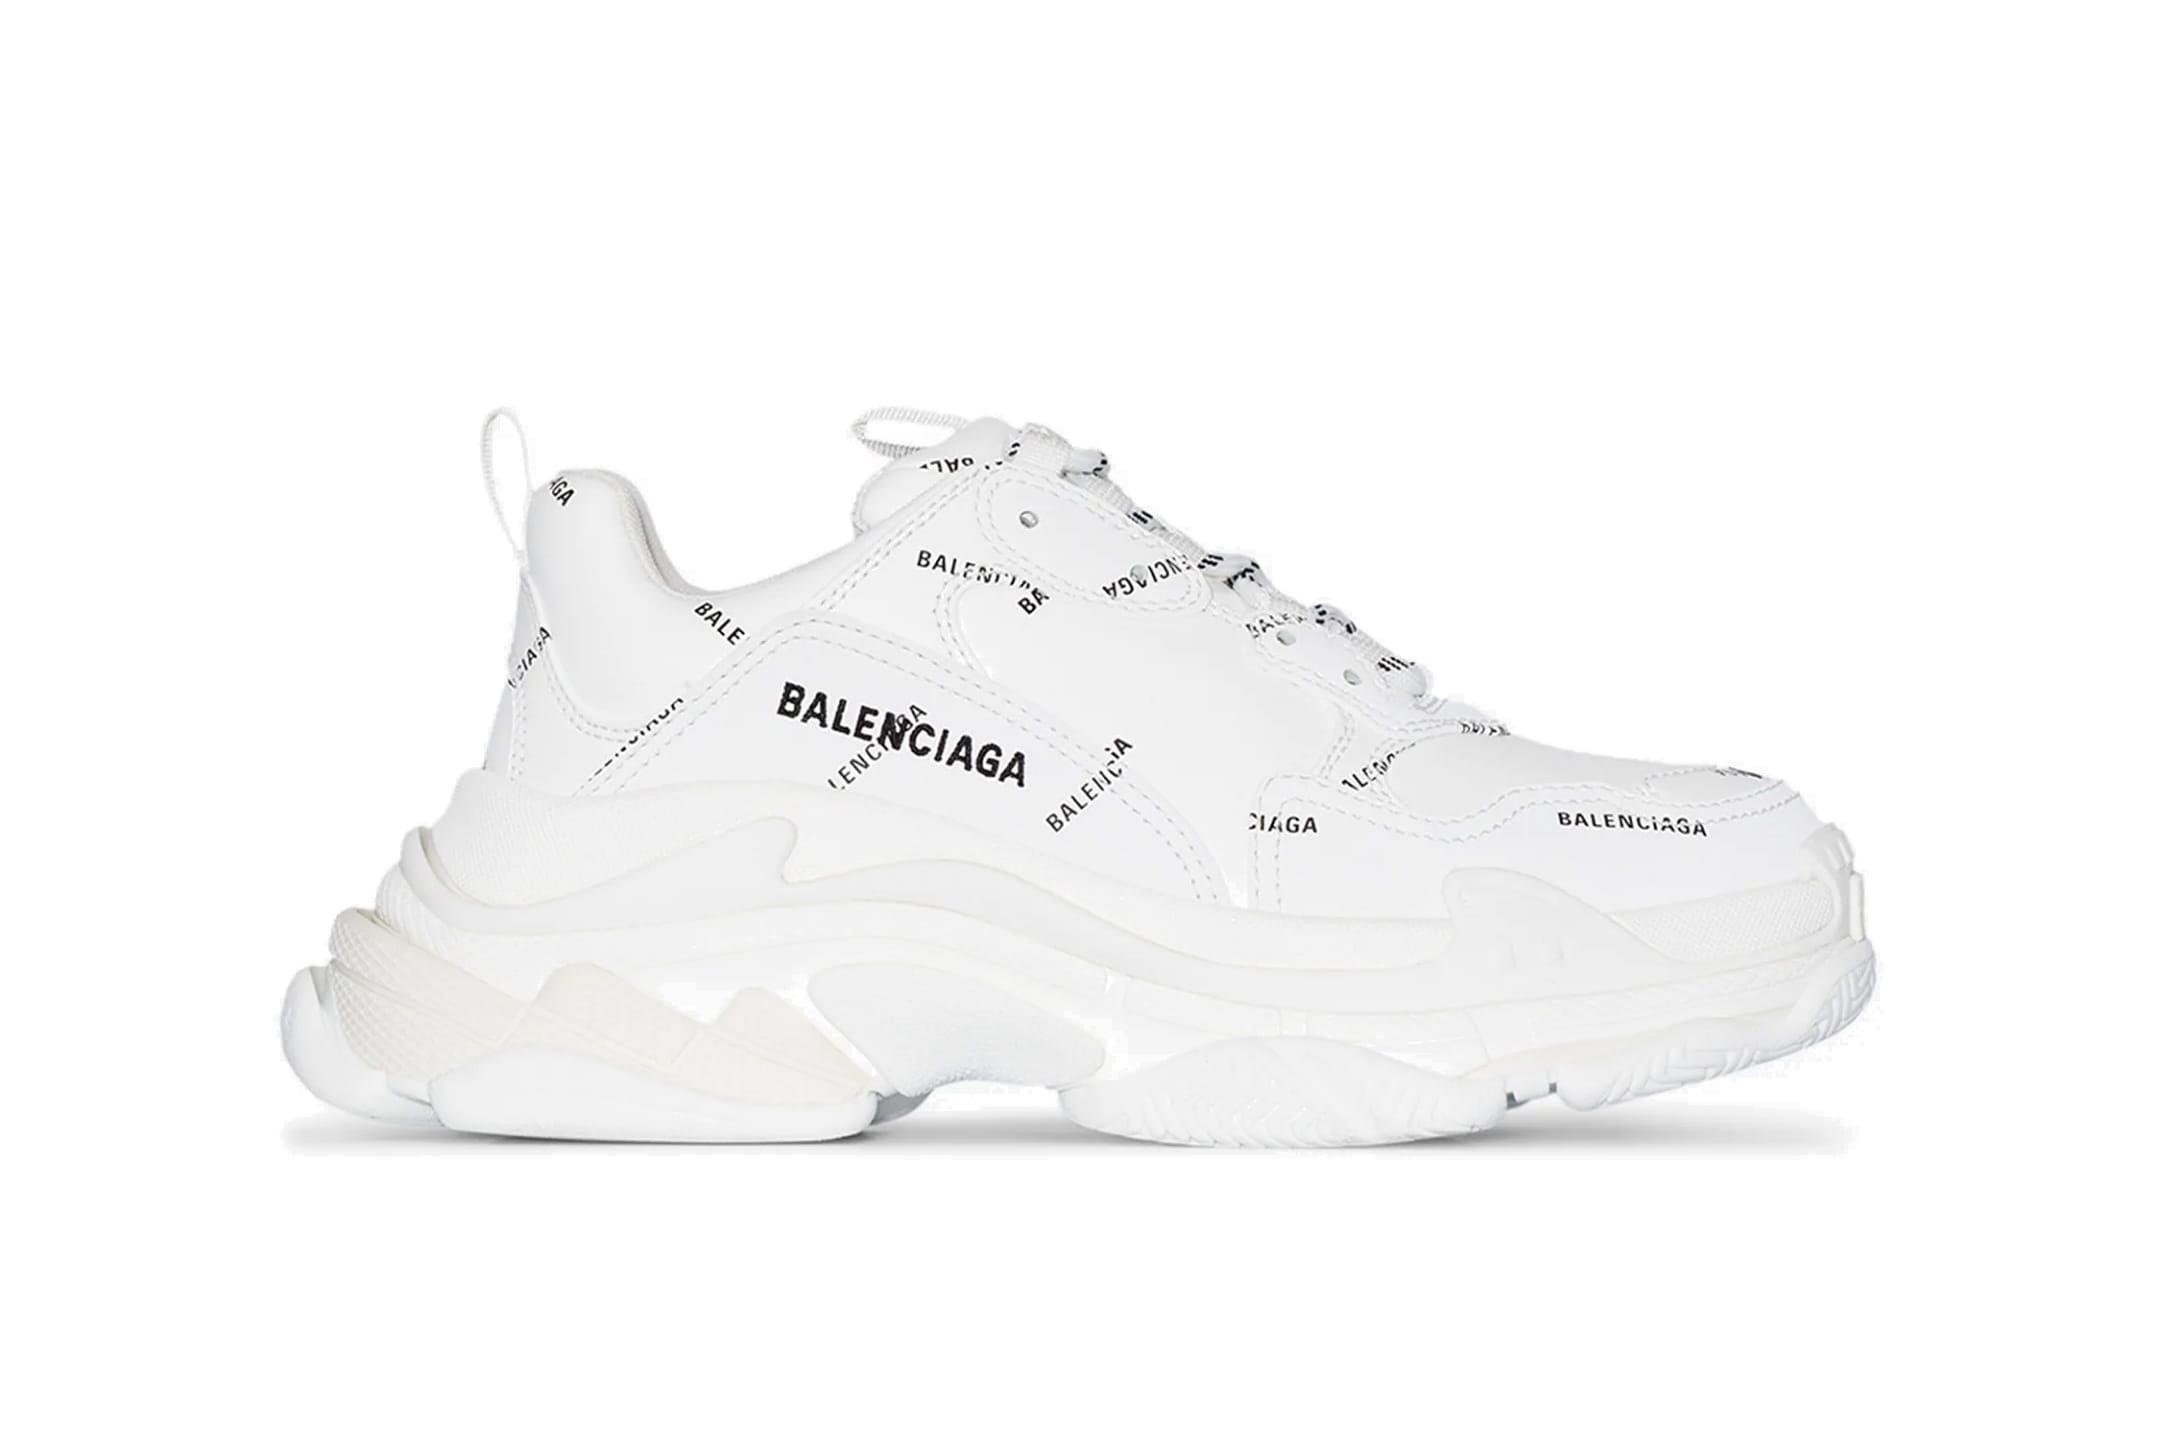 Balenciaga Balenciaga Triple S Black red white 2019 Grailed